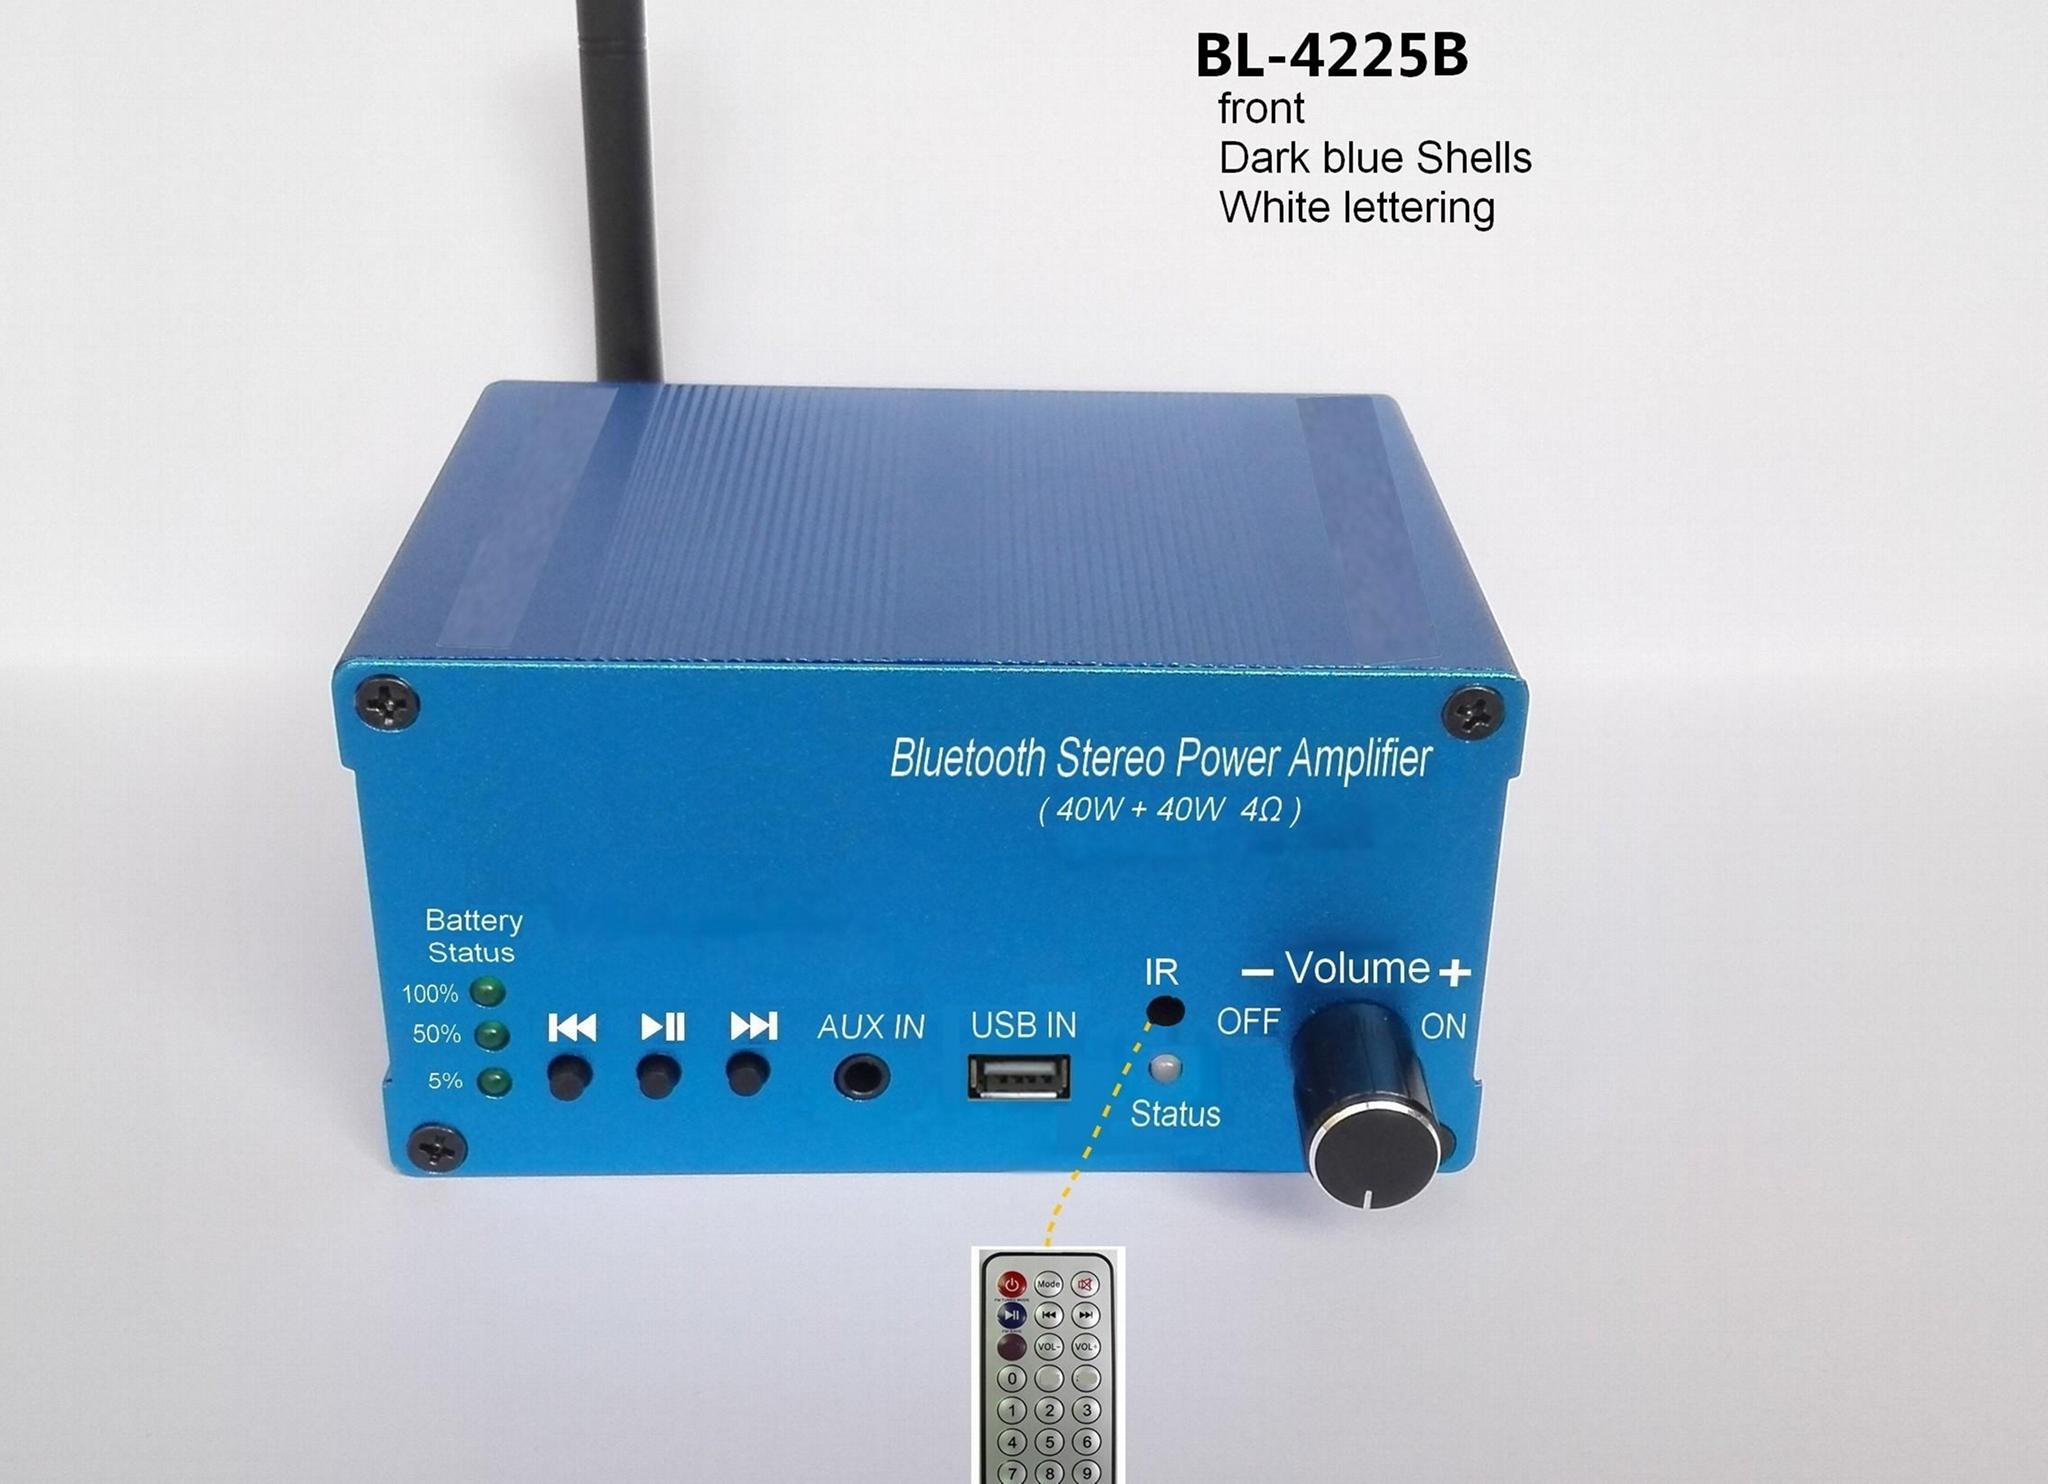 wireless Bluetooth Audio power amplifier 40Wout/Built in batte4000mAh/external